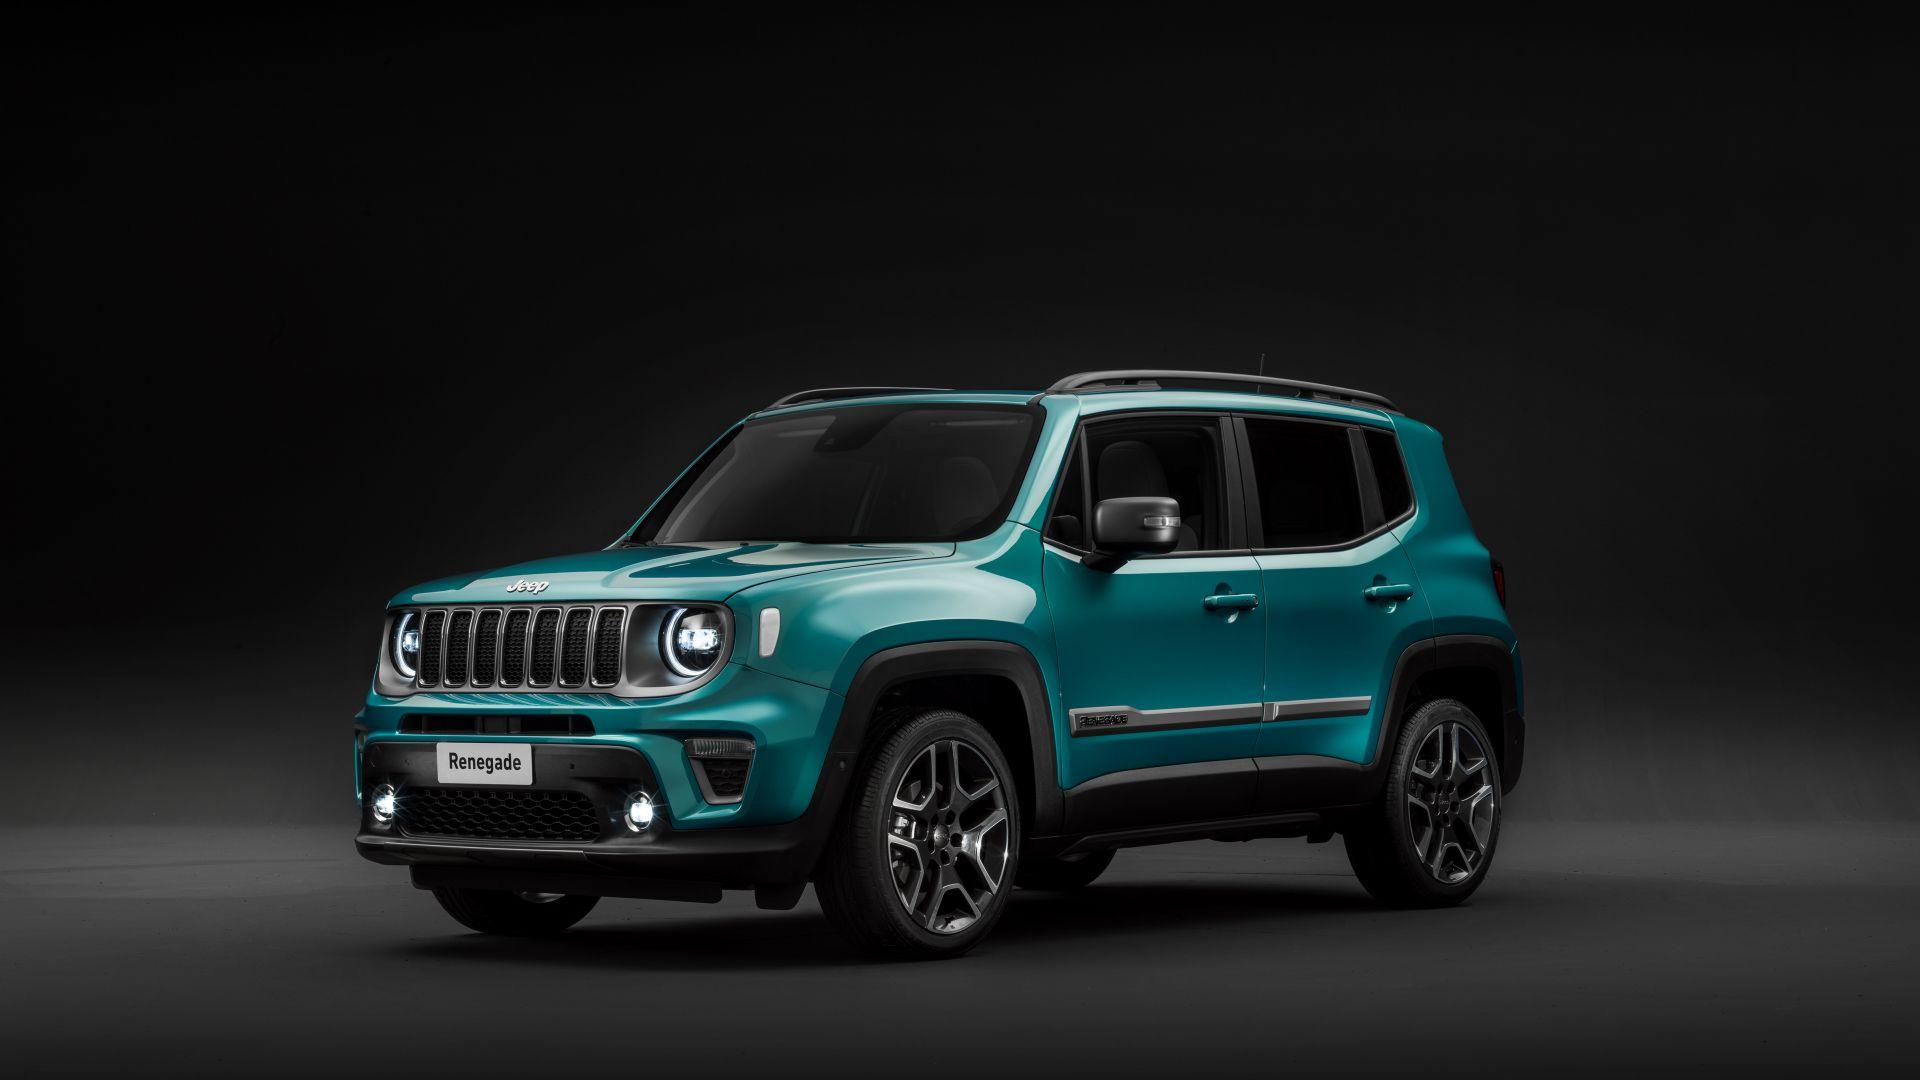 Jeep Renegade Limited >> Jeep Renegade Bikini: a Ginevra 2019 la nuova livrea by ...